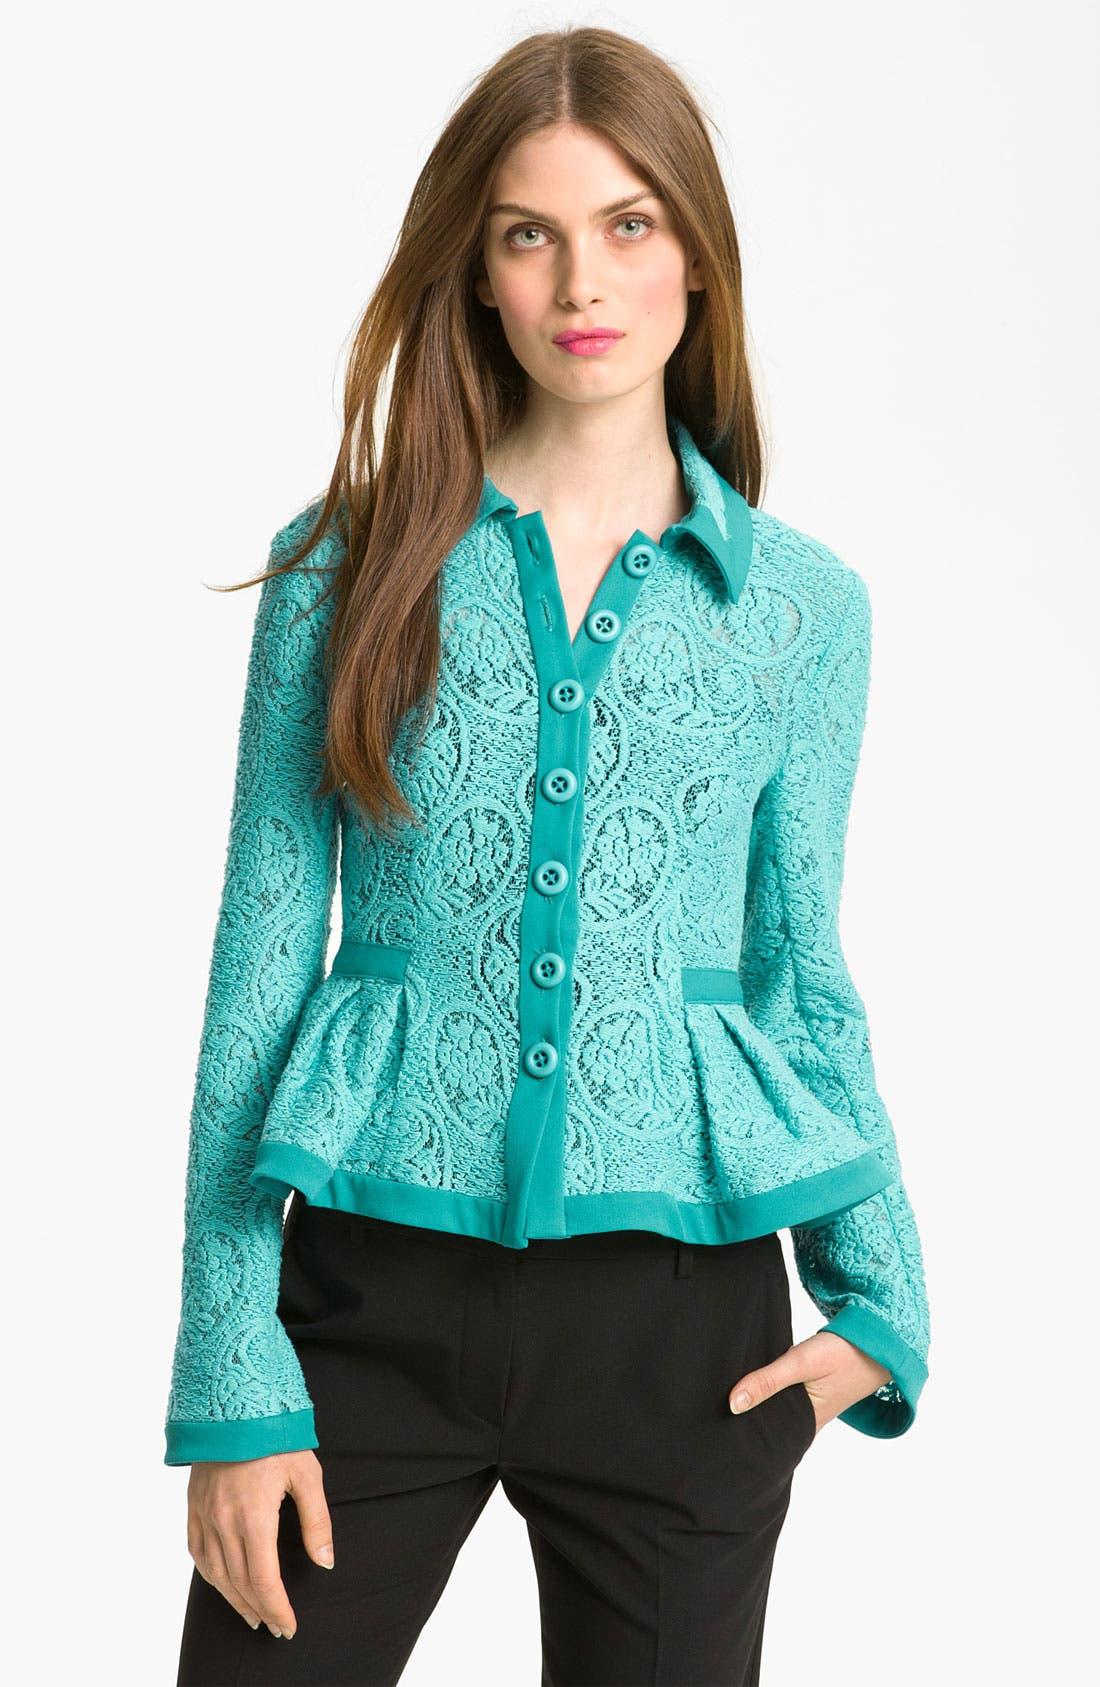 Alternate Image 1 Selected - Nanette Lepore 'Summer Flame' Lace Jacket